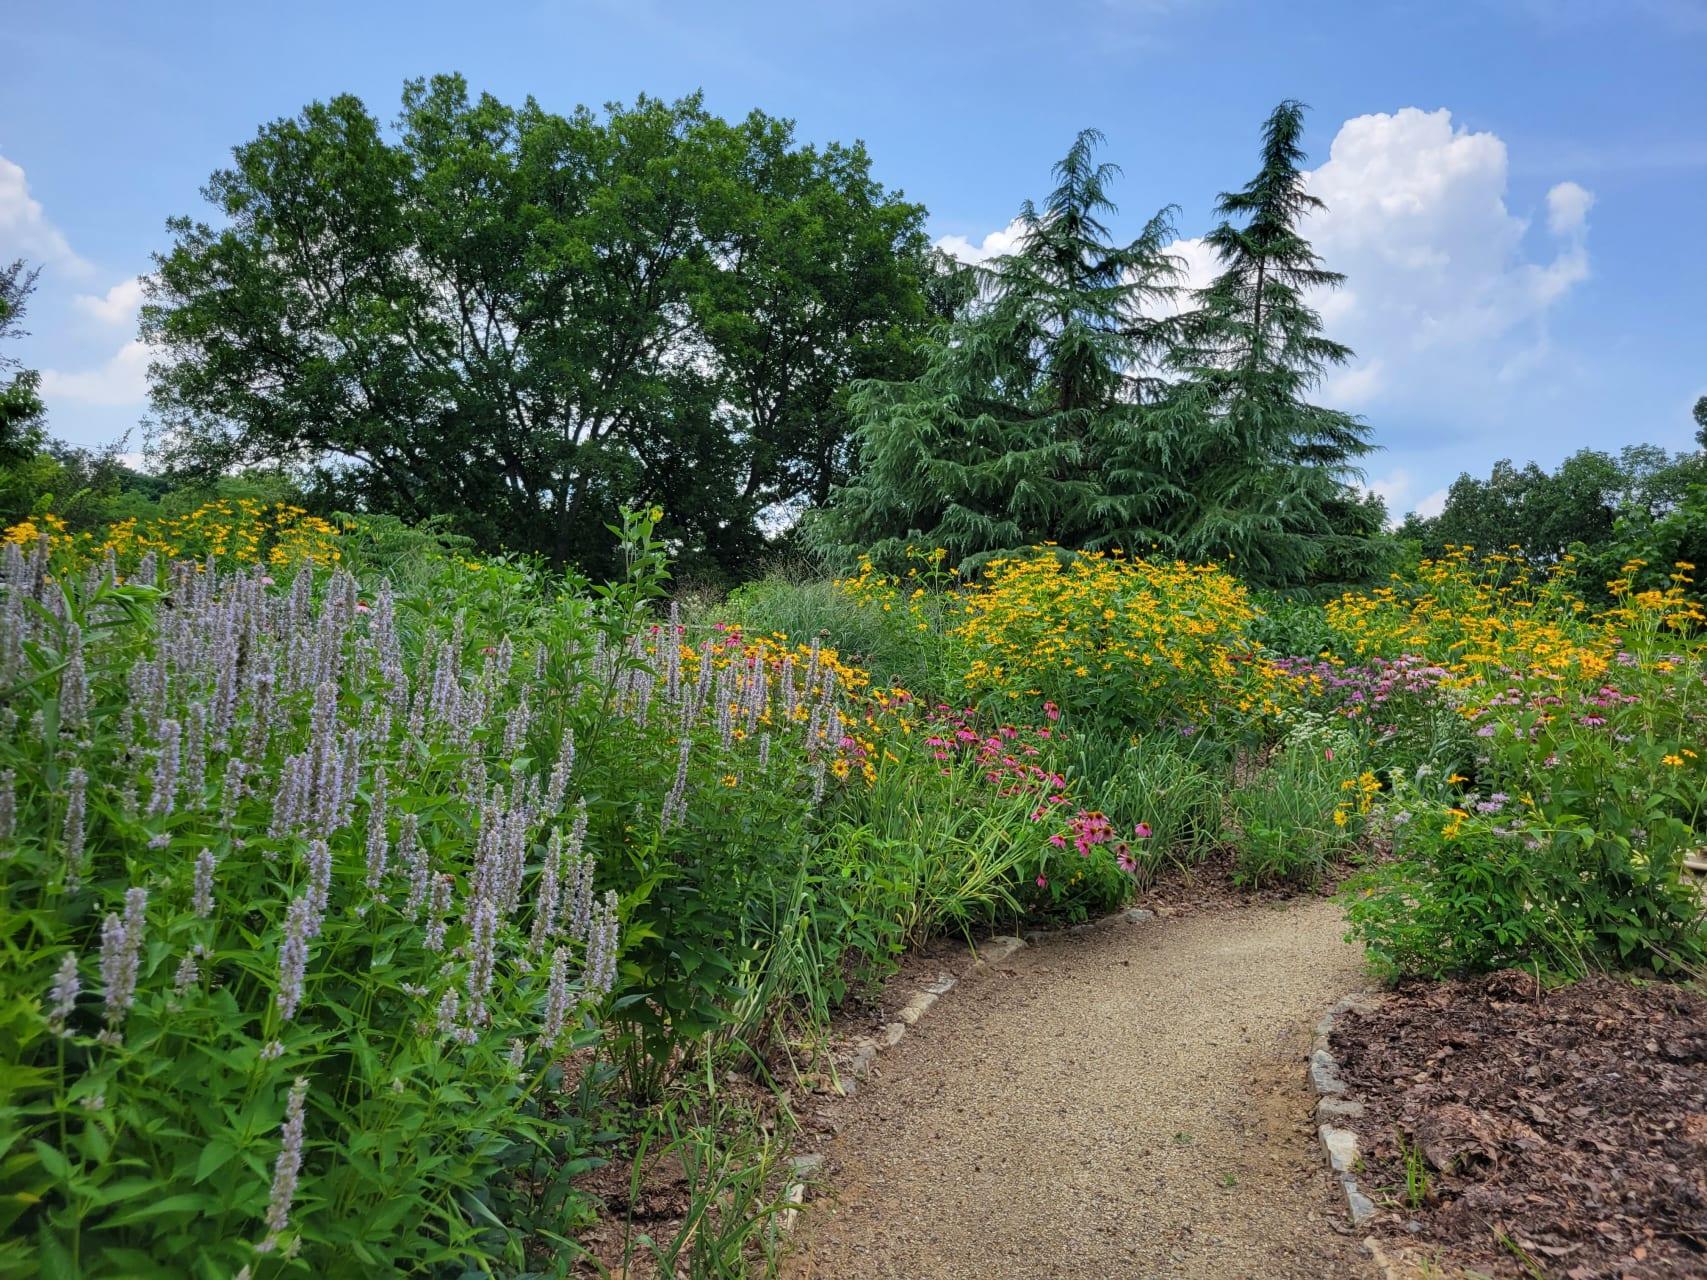 Philadelphia - Historic Philadelphia Cemetery and Arboretum